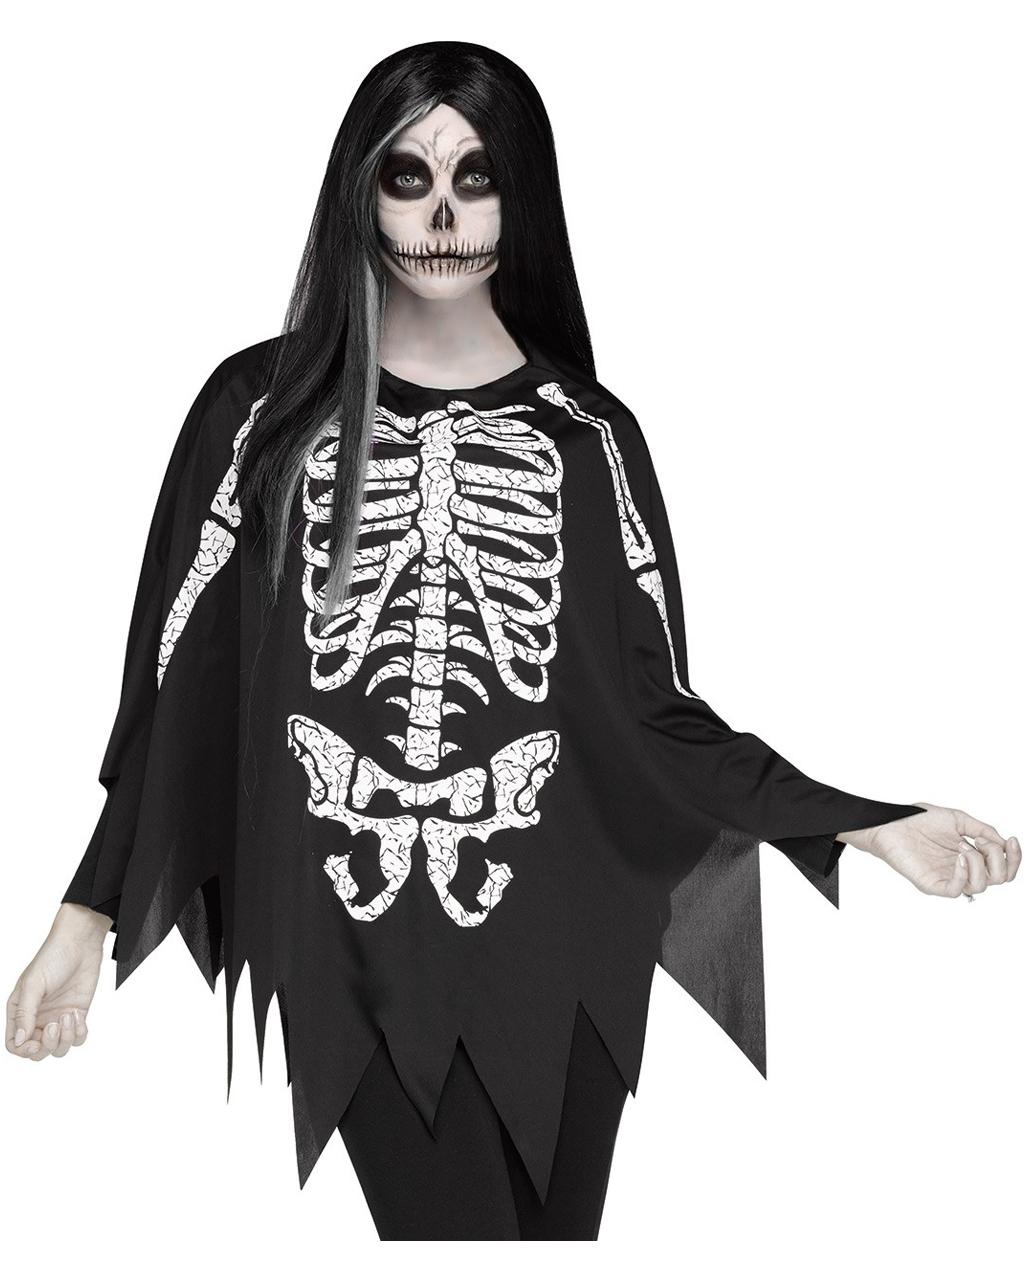 Halloween Kostuem Skelett Amazon.Skelett Poncho Als Halloween Kostum Horror Shop Com